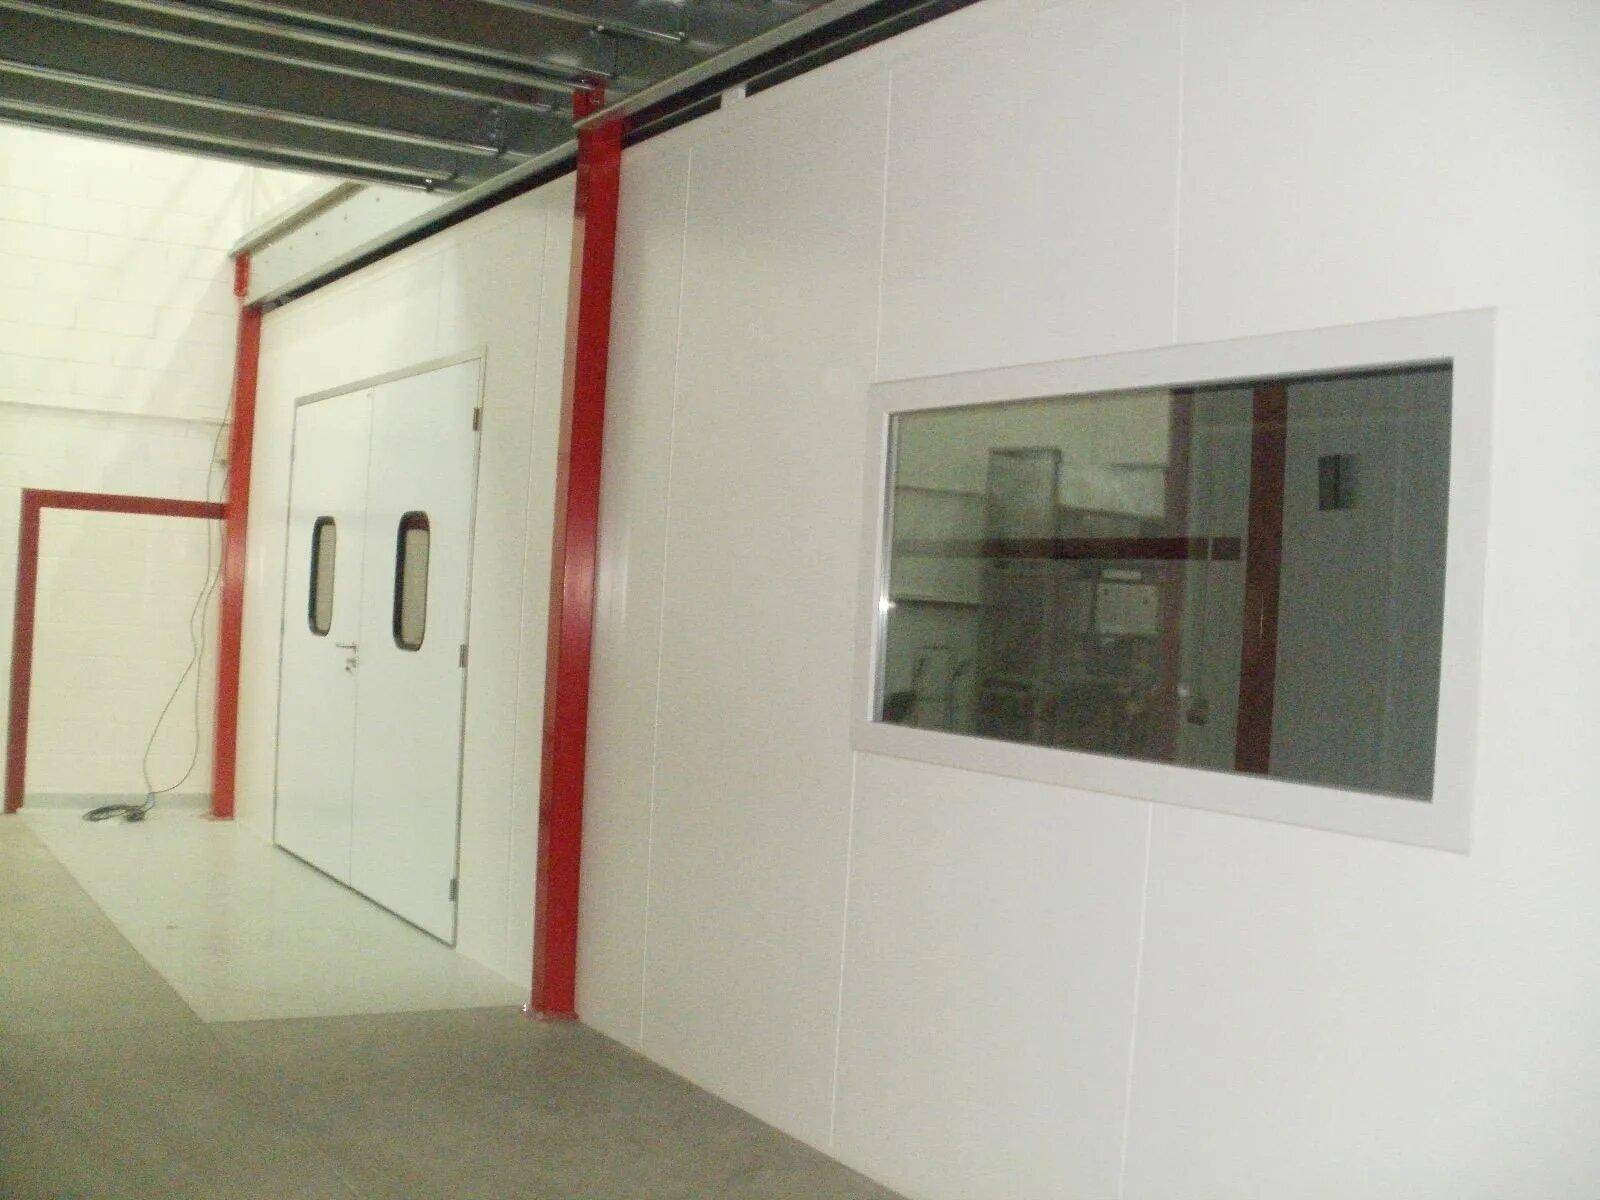 Chambre froide à Wasselonne │ ISOMAT